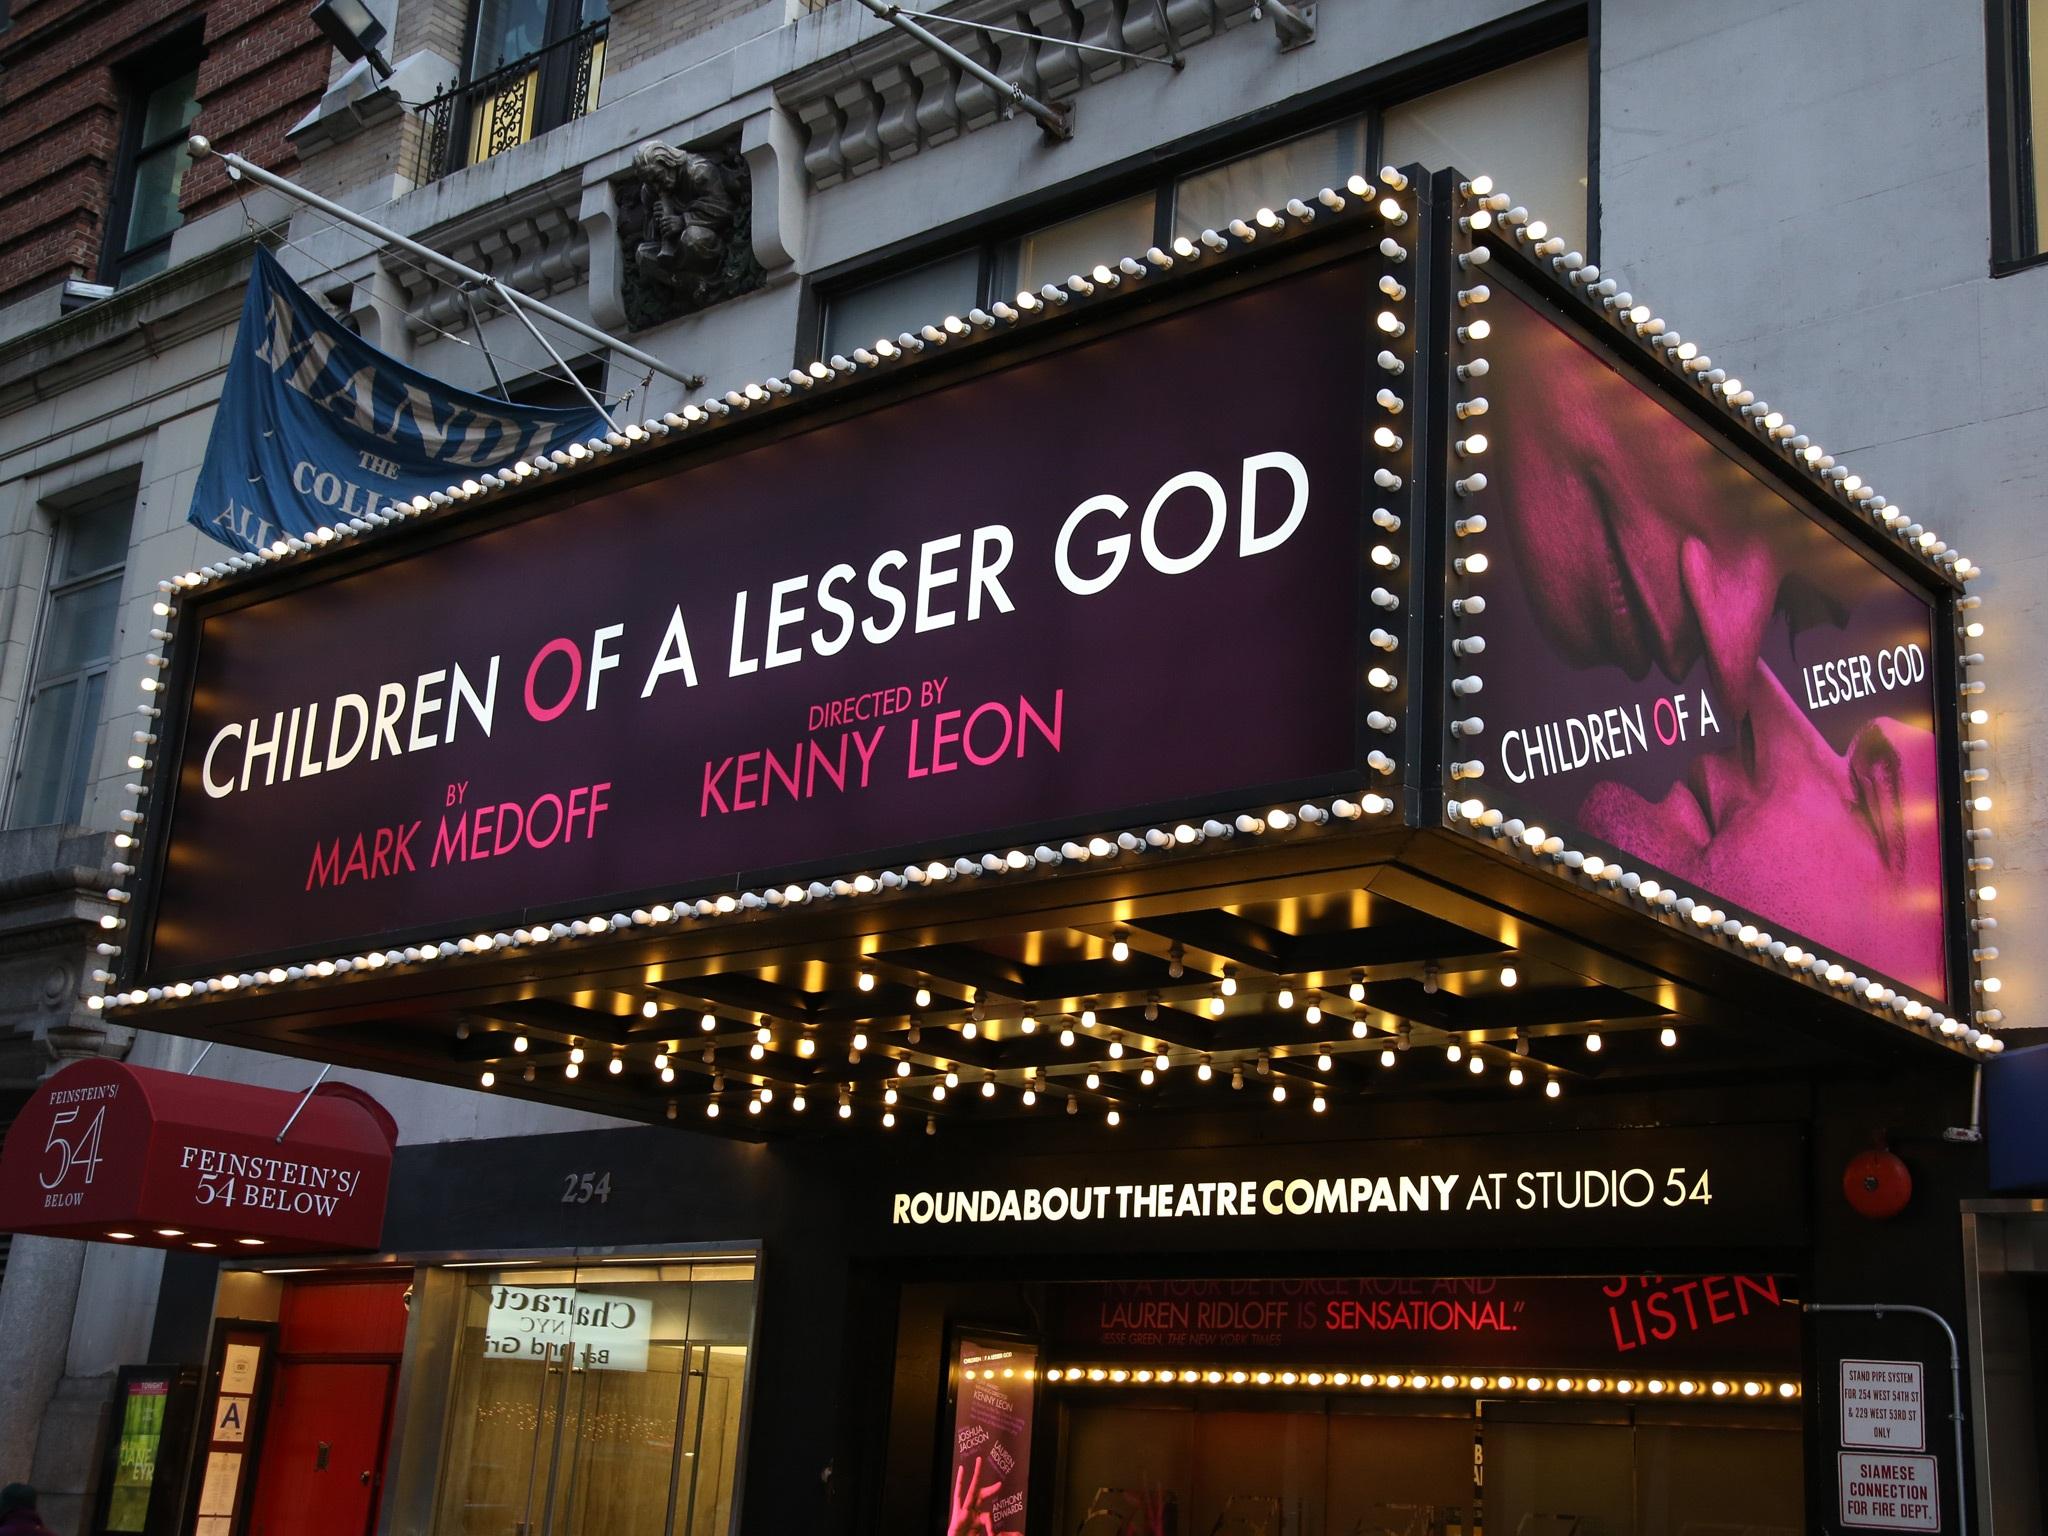 Children Of A Lesser God Theatre Marquee